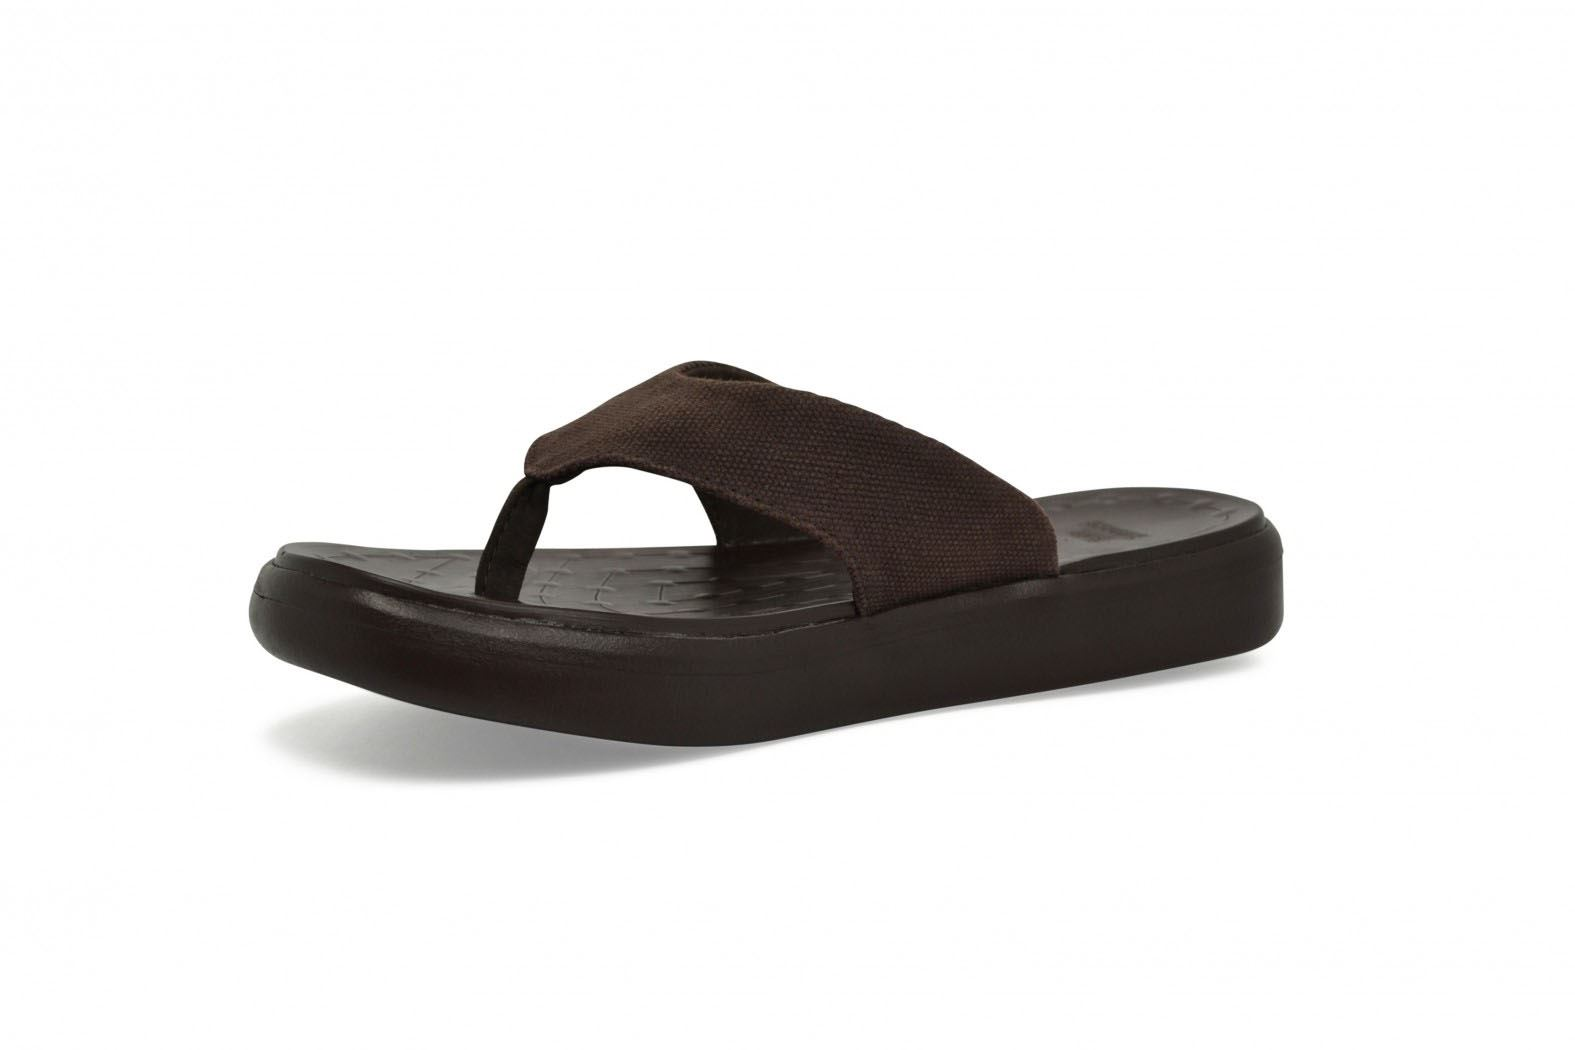 ecfbab9dda55fd Soft Science Comfort Footwear~Skiff Canvas Flip Flop~11 Colours ...